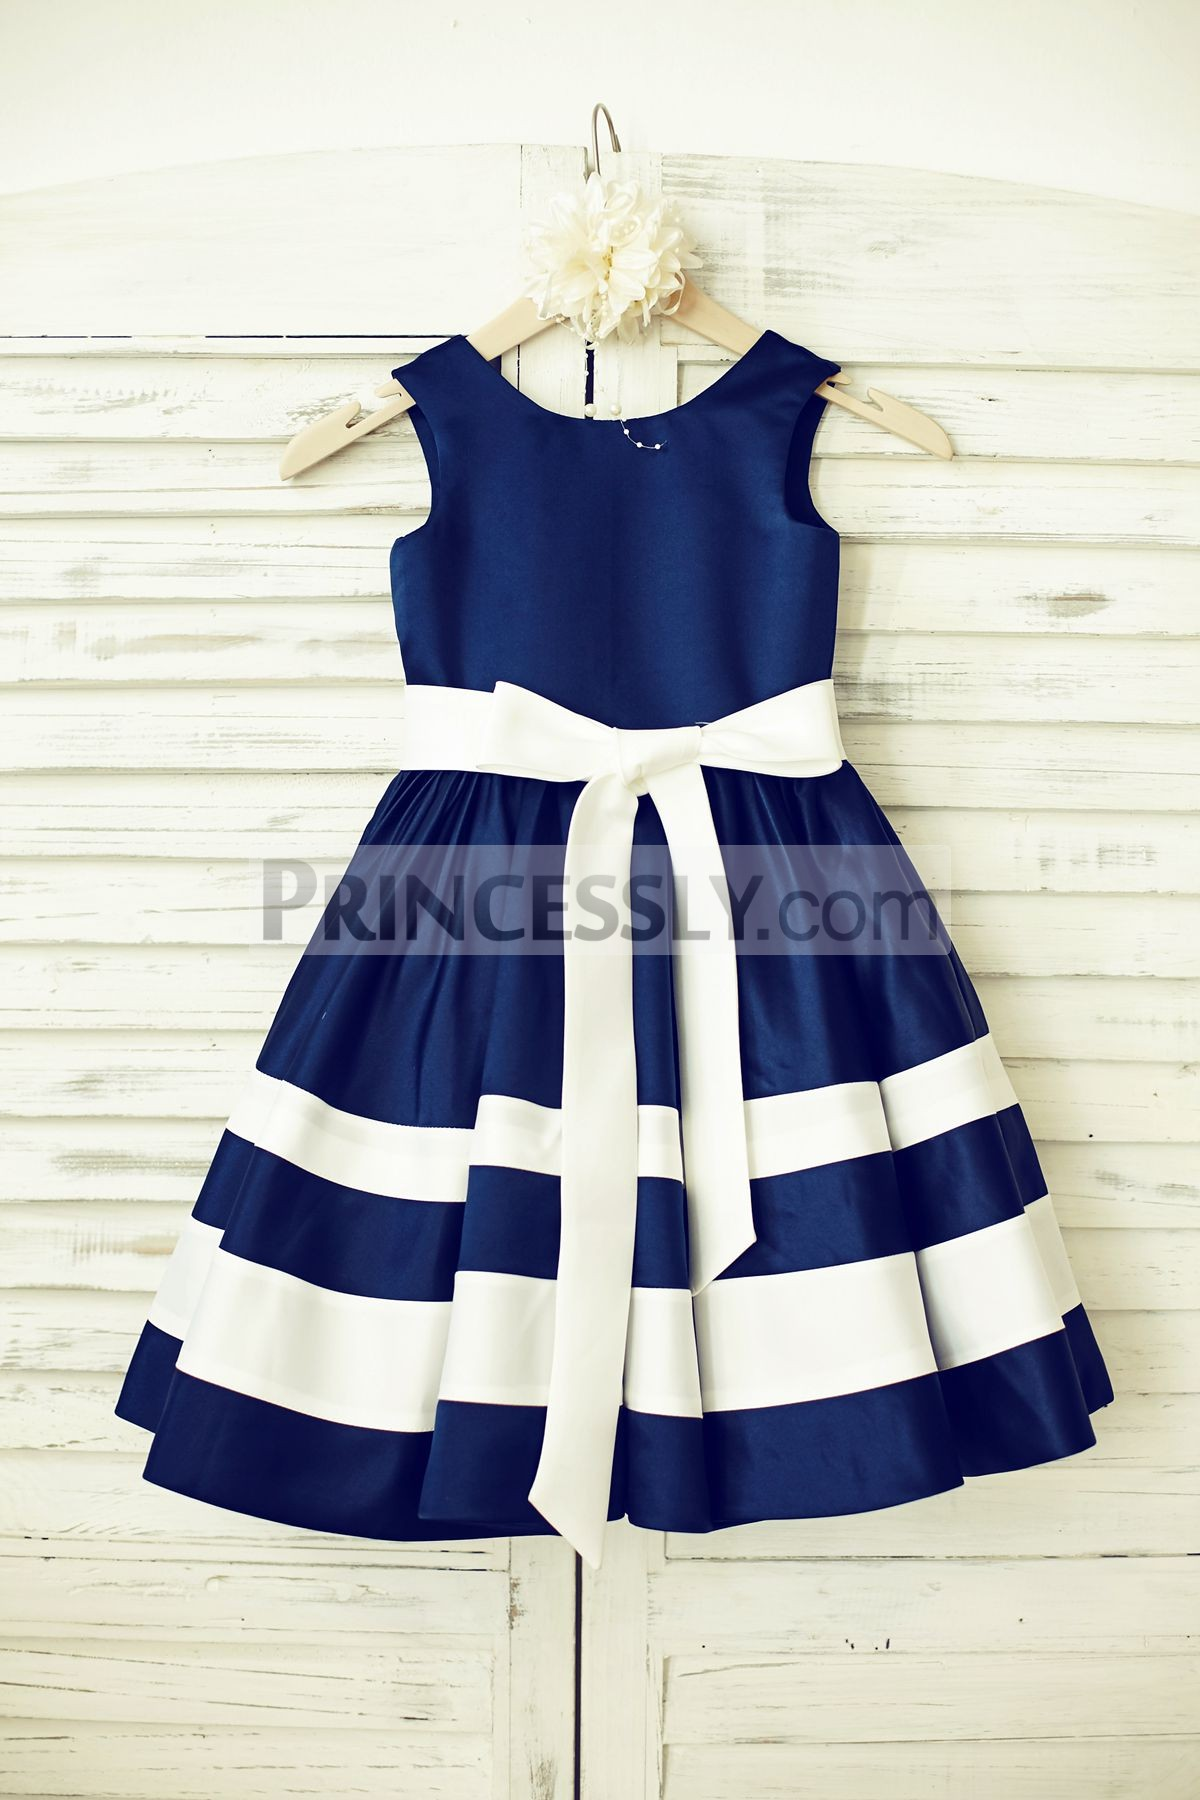 Princessly.com-K1000195-Navy Blue Satin Ivory Striped Flower Girl Dress-31